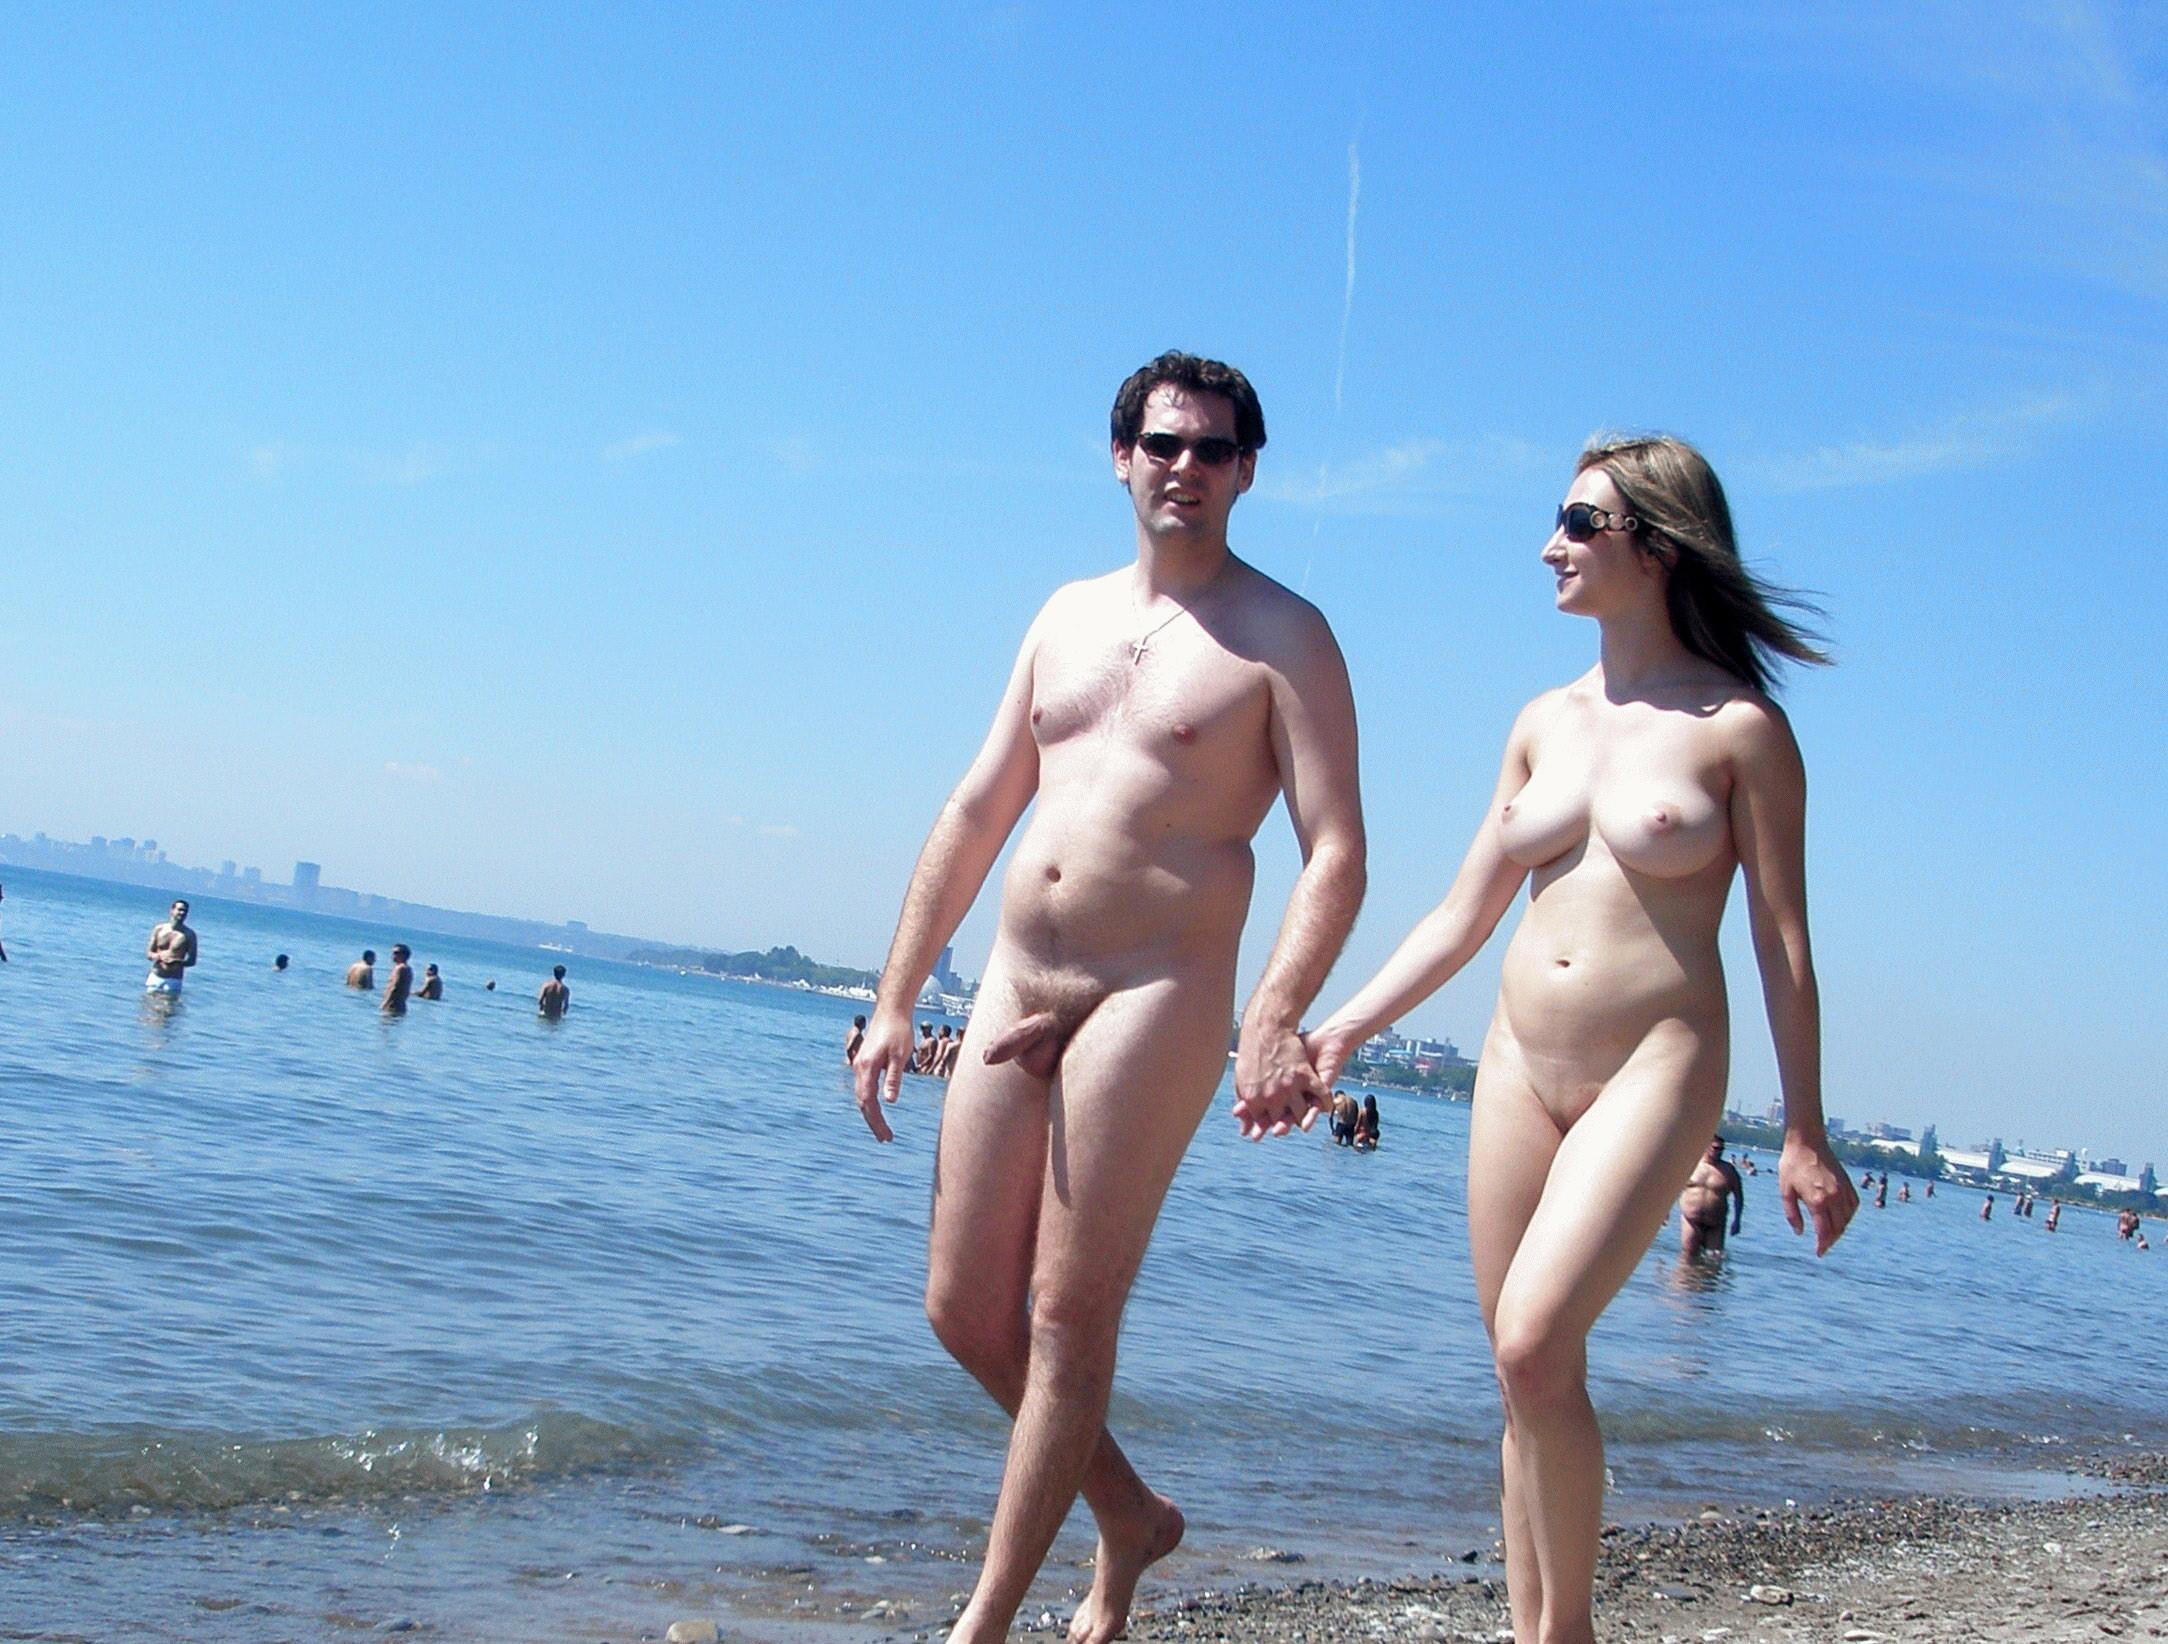 foto-nudistskih-par